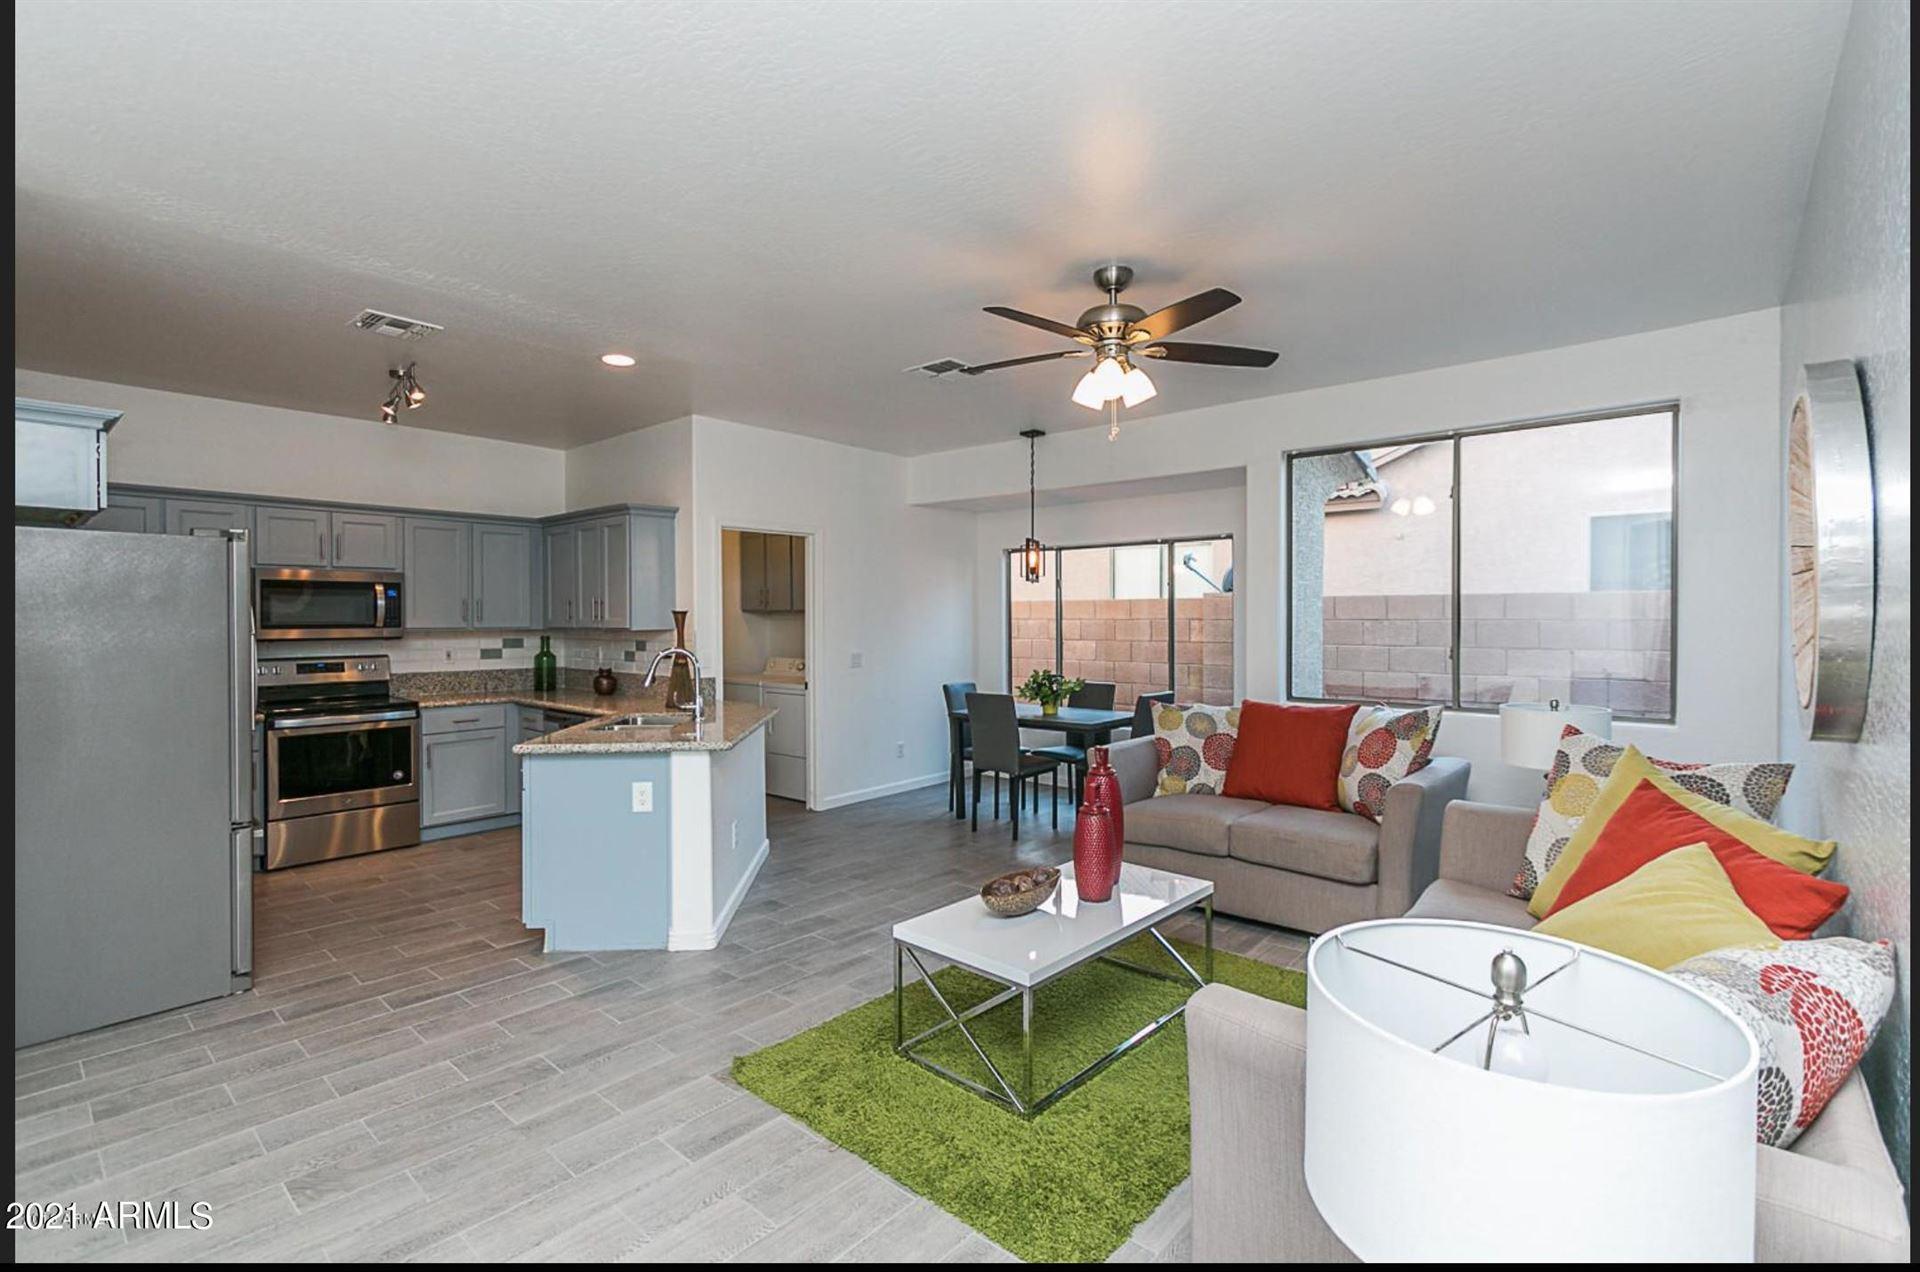 Photo of 12556 W MONTEREY Way, Avondale, AZ 85392 (MLS # 6247518)